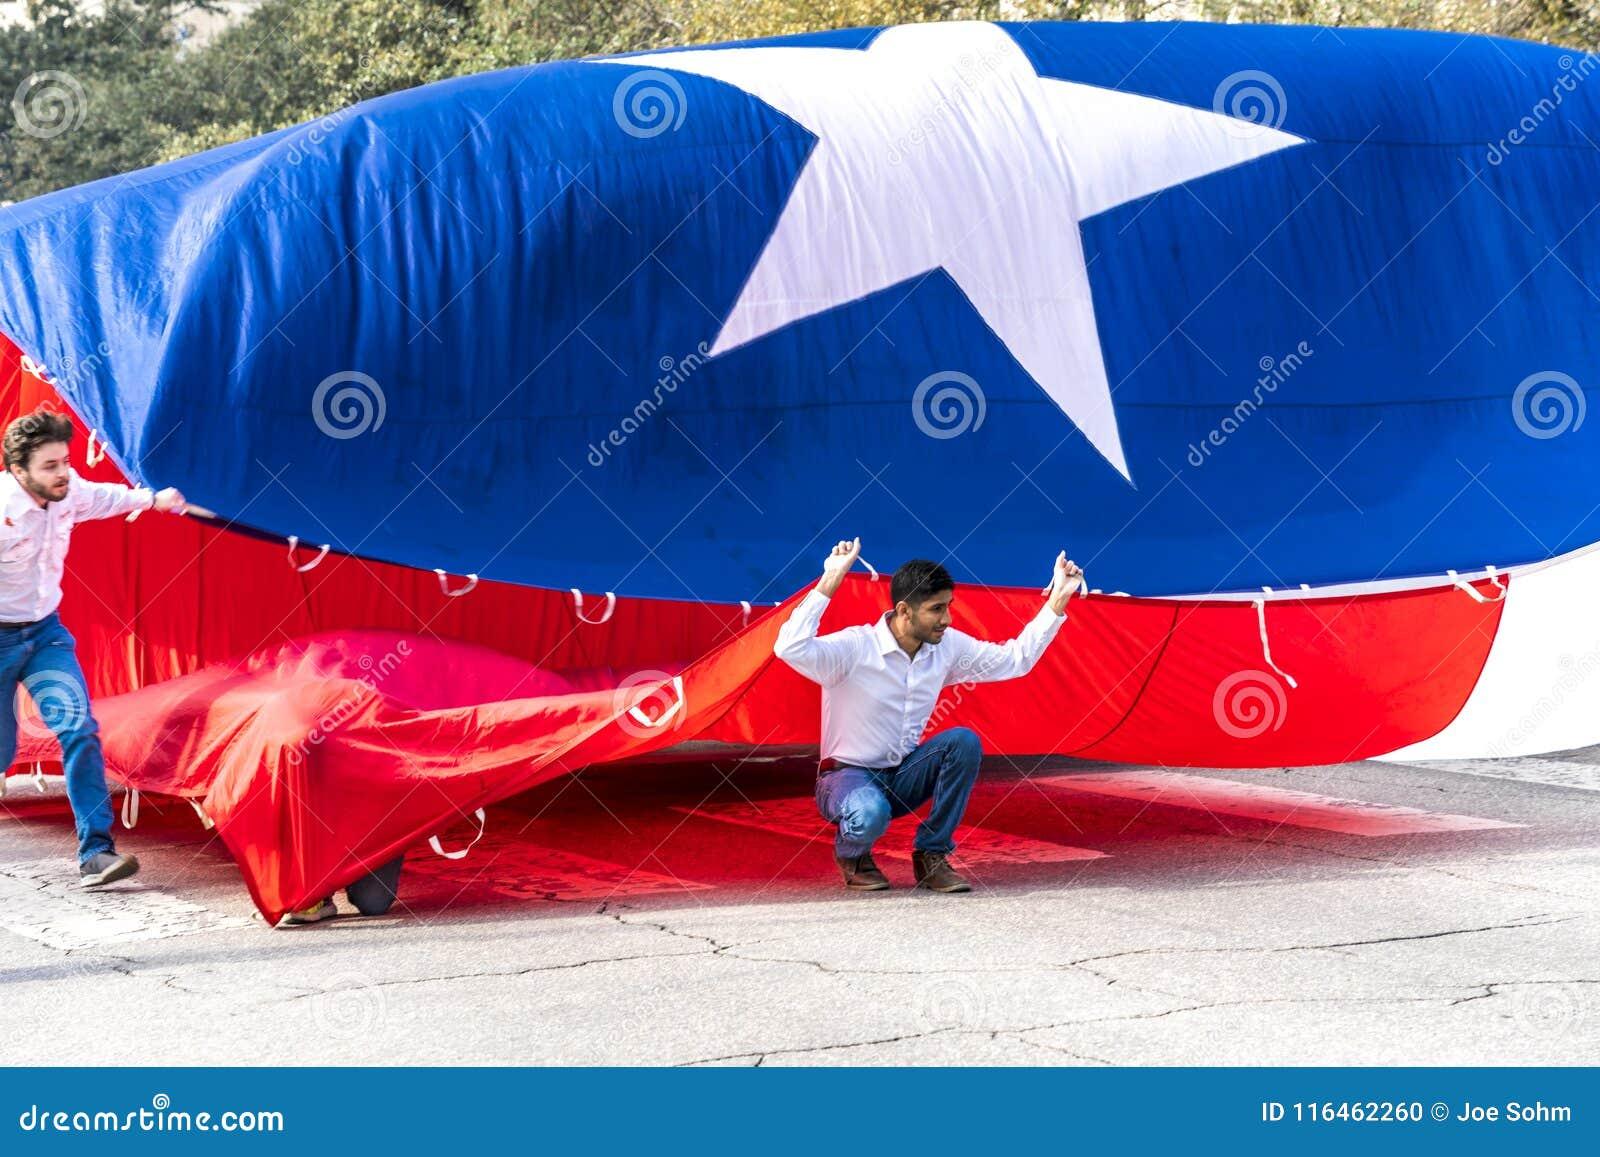 MARCH 3, 2018 - AUSTIN TEXAS - University of Texas students carry Texas flag down Congress Avenue. Mexico, Annual